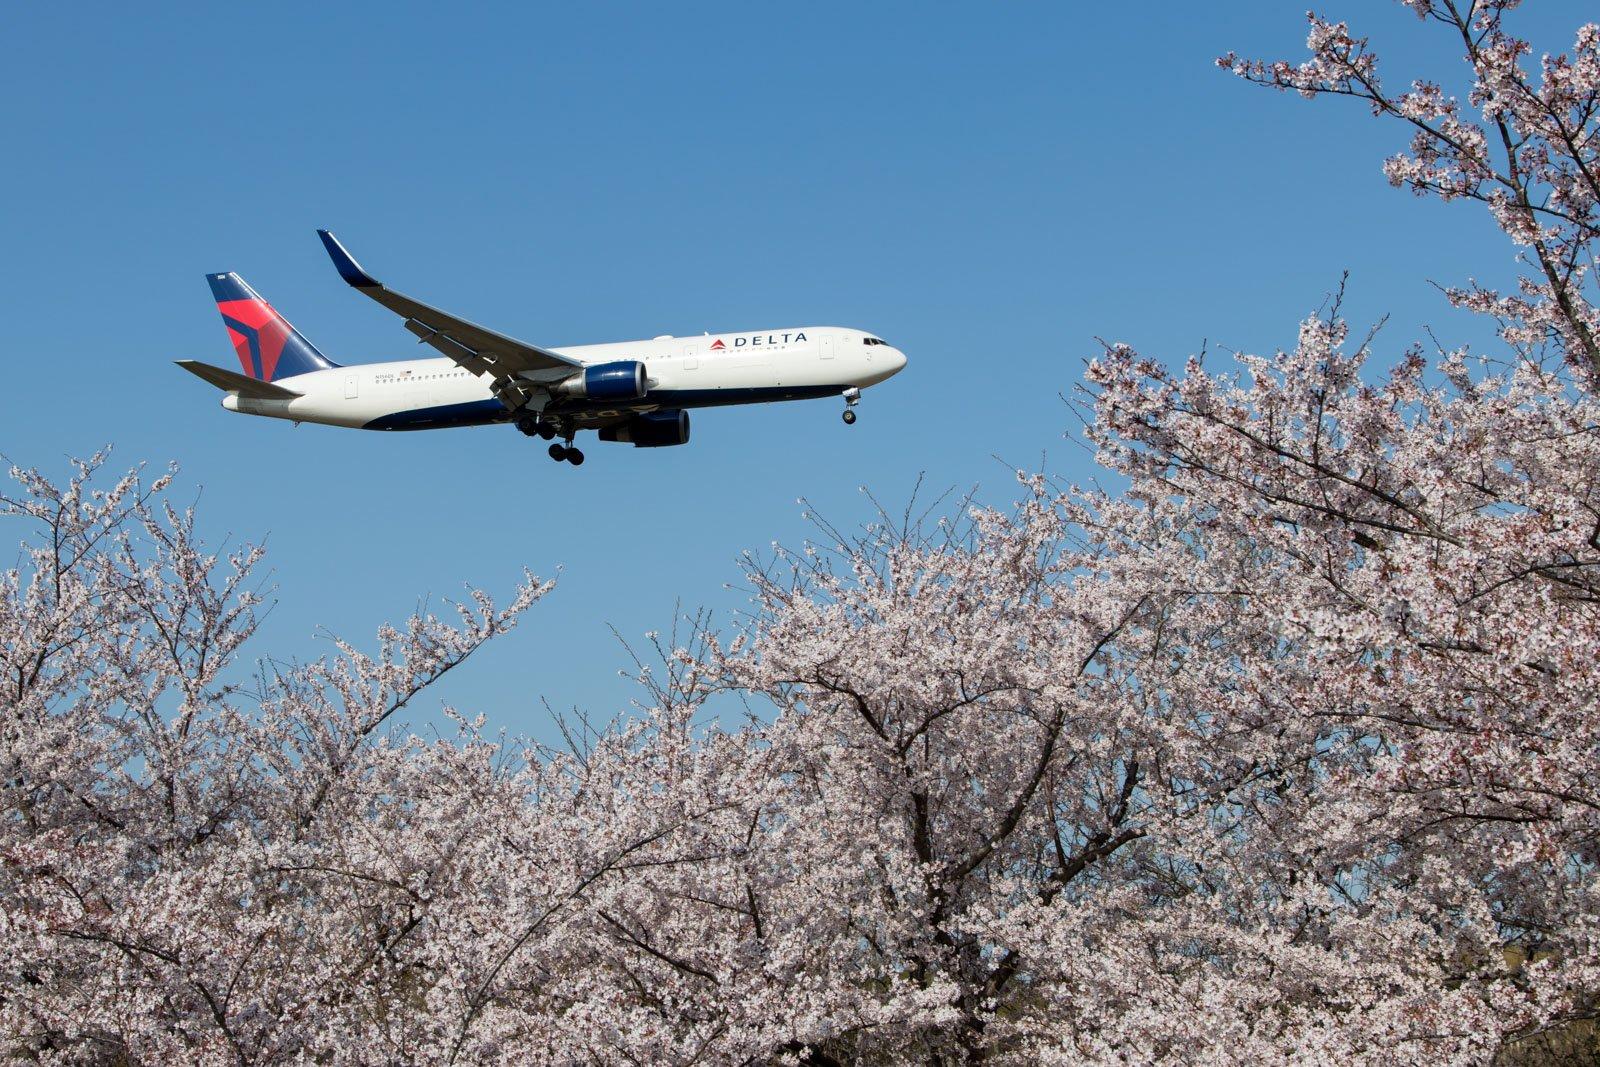 Delta Air Lines Boeing 767-300ER Narita